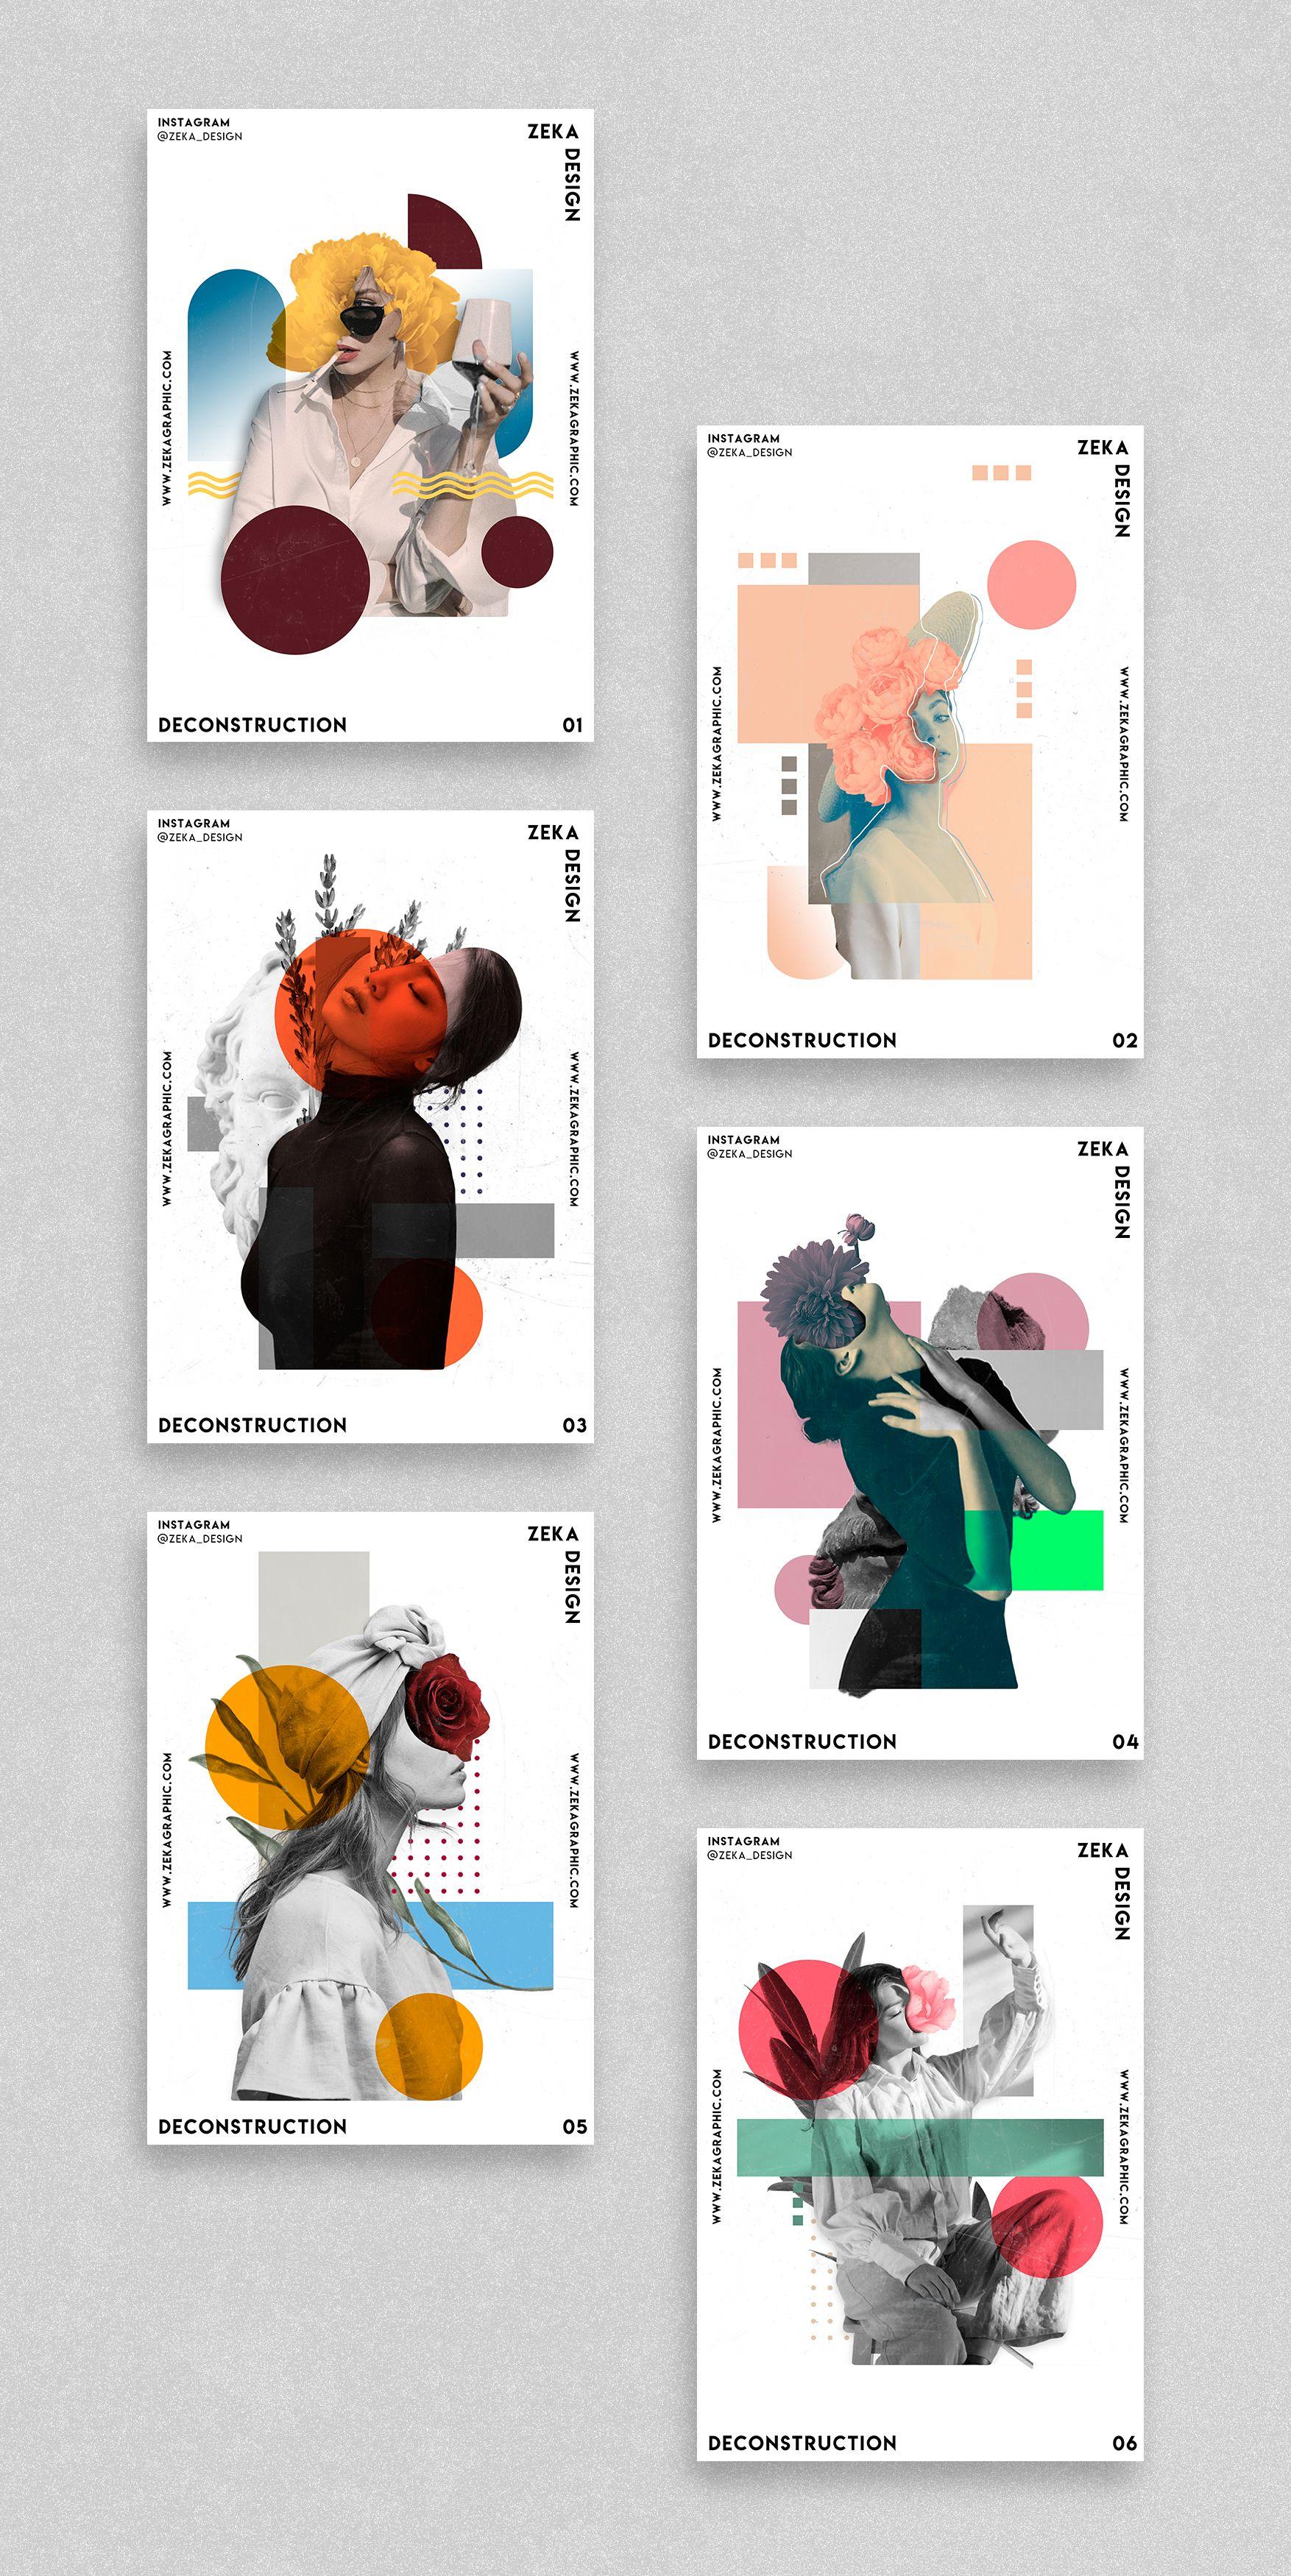 Deconstruction Poster Design Project Graphic Design Inspiration by Zeka Design